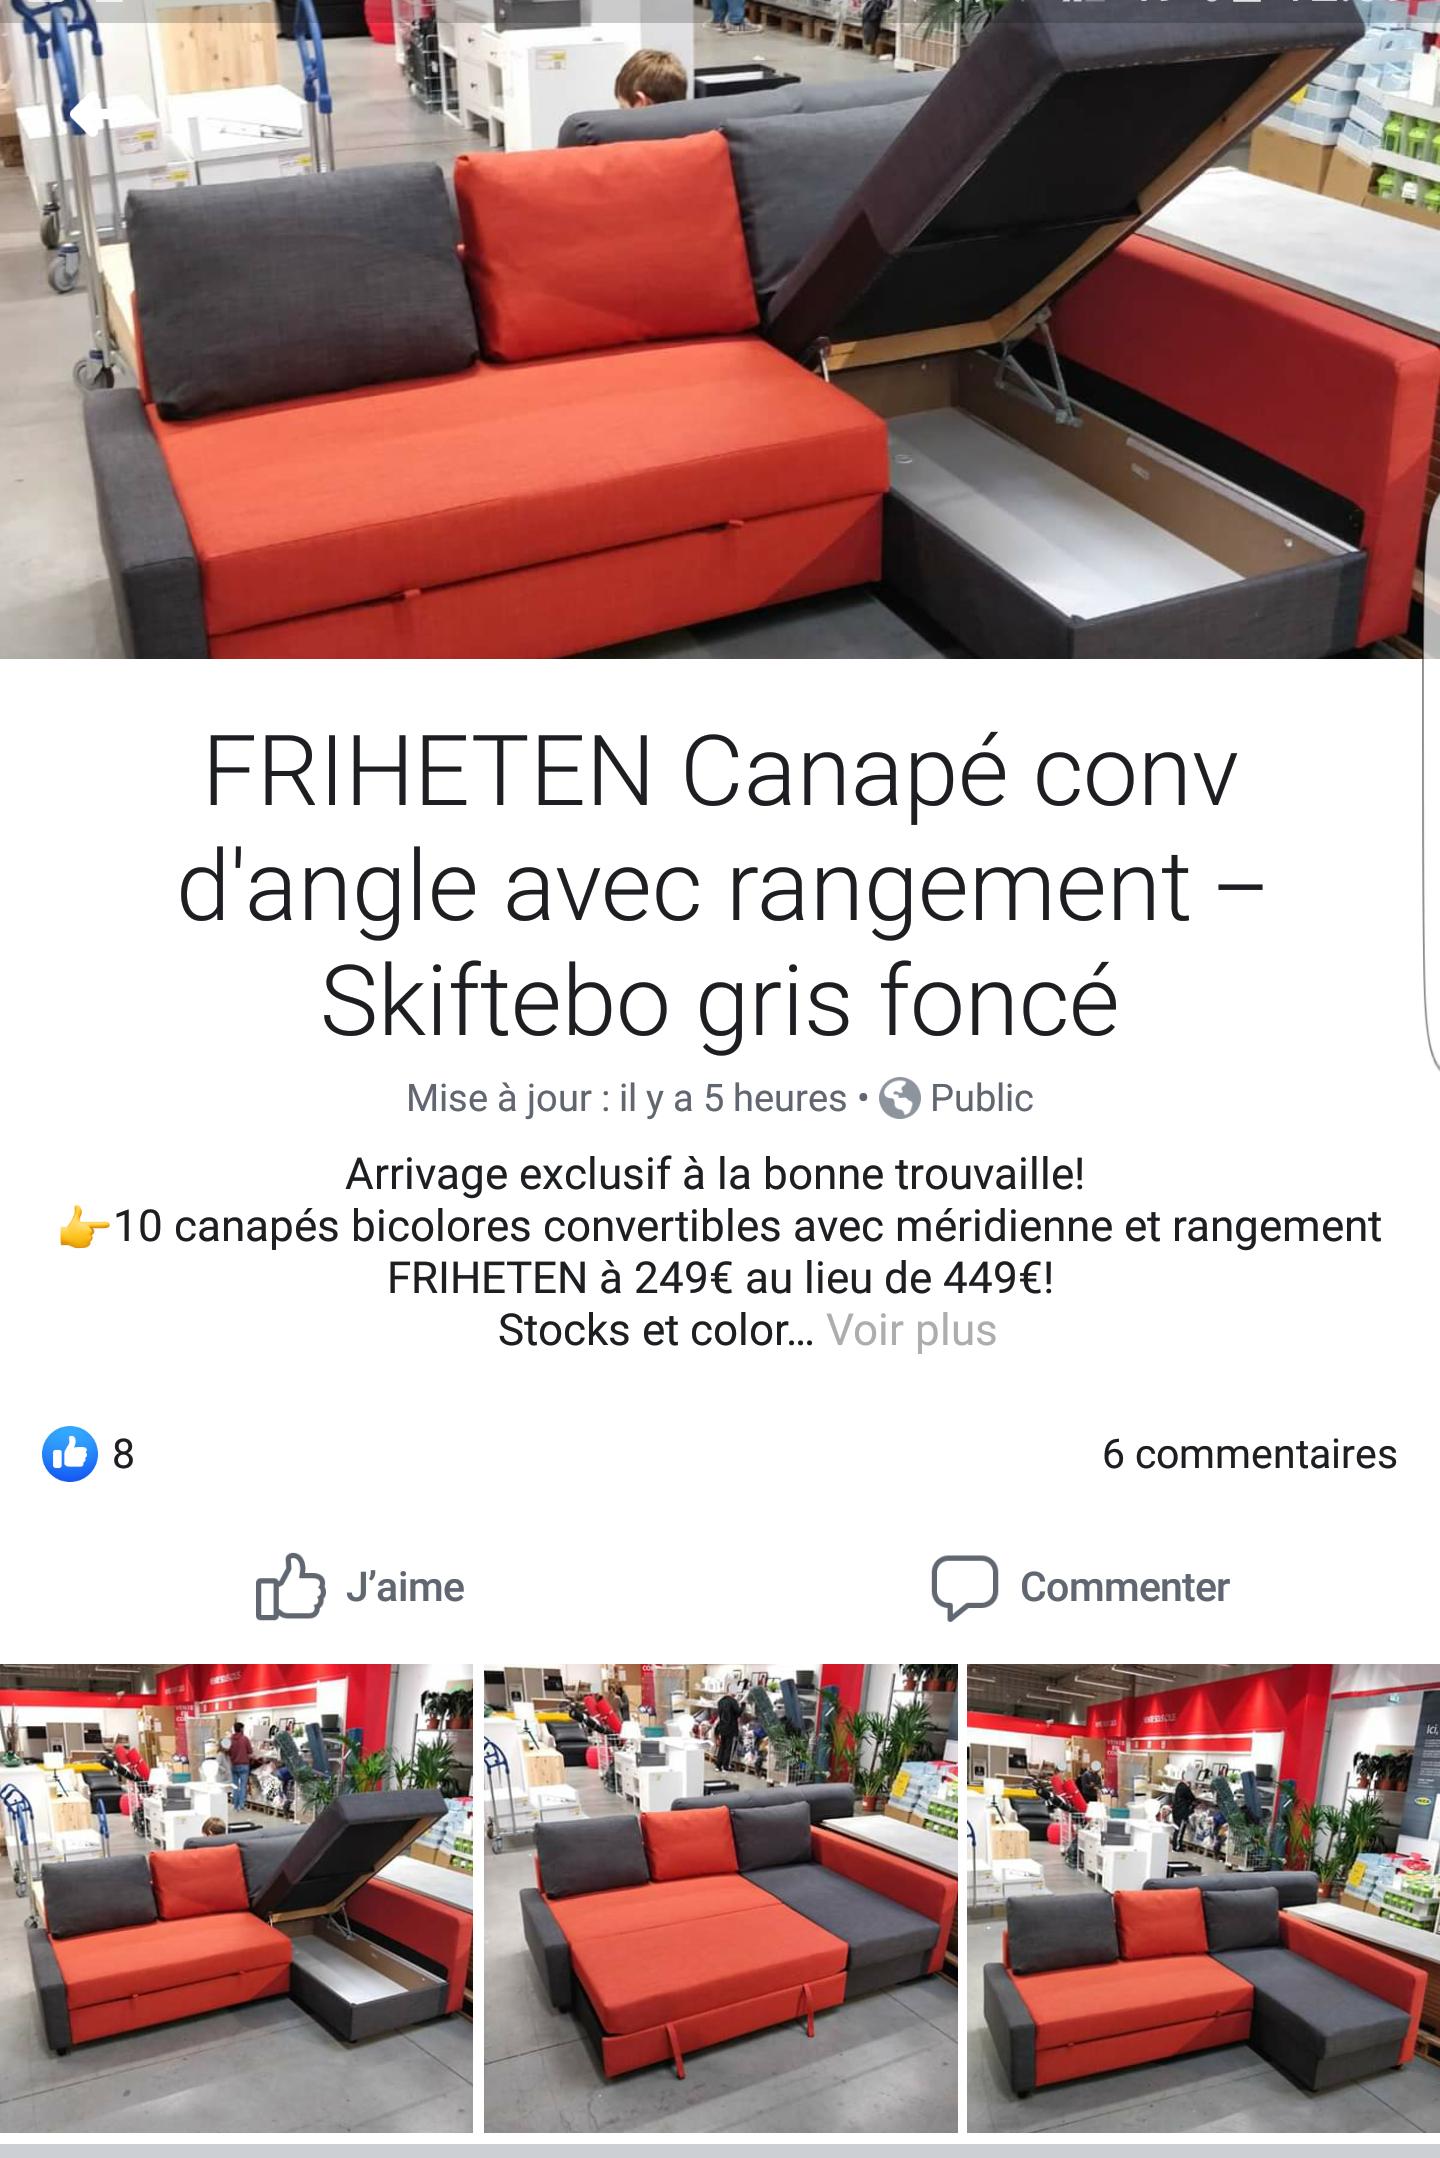 Canapé convertible Frihenten - Occasion, Ikea Henin Beaumont (62)